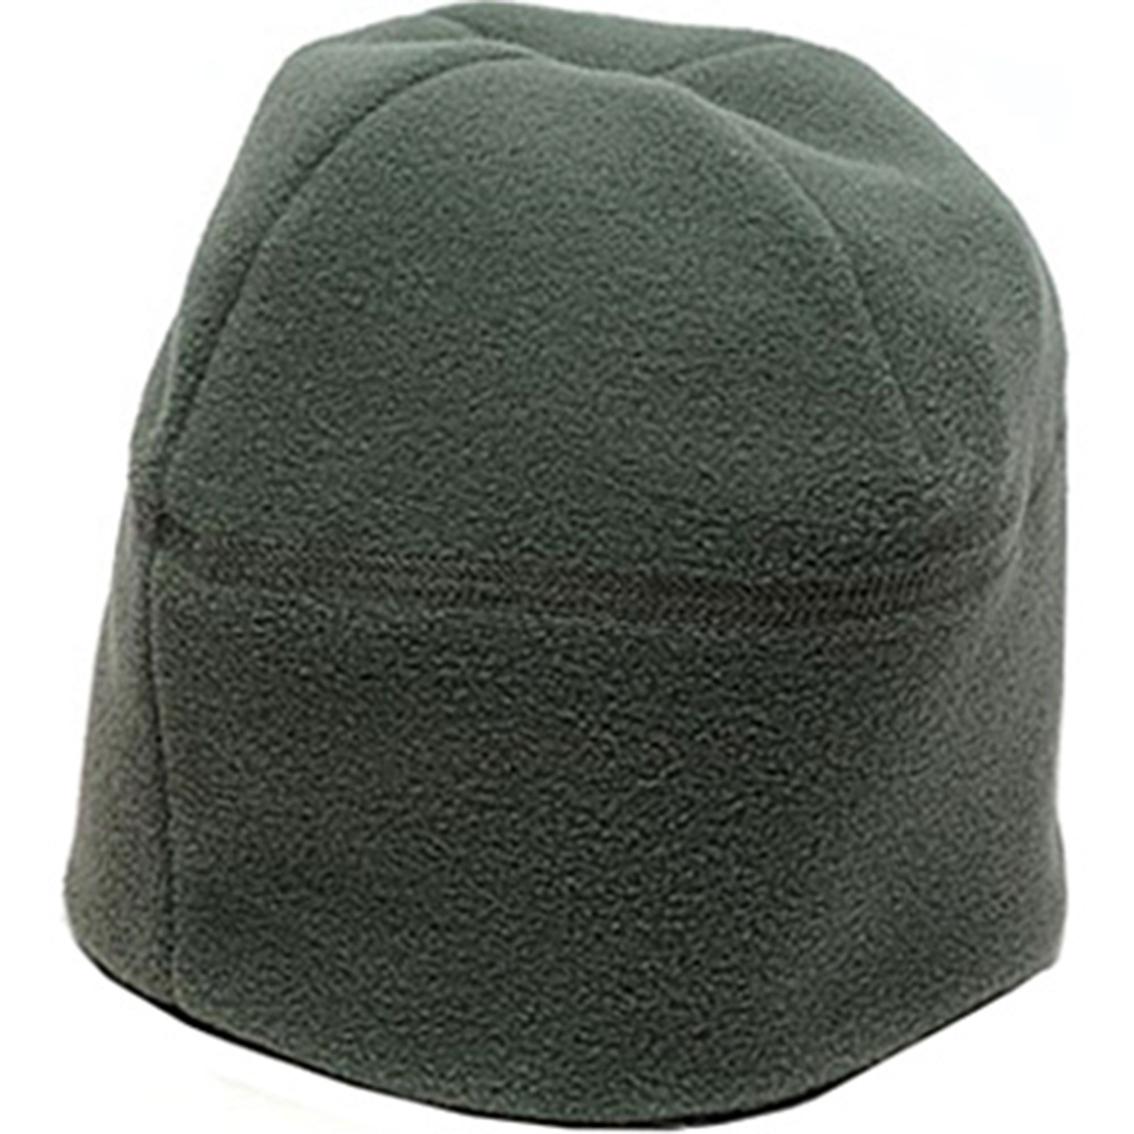 Dlats Acu Green Micro Fleece Cap Headgear Shop The